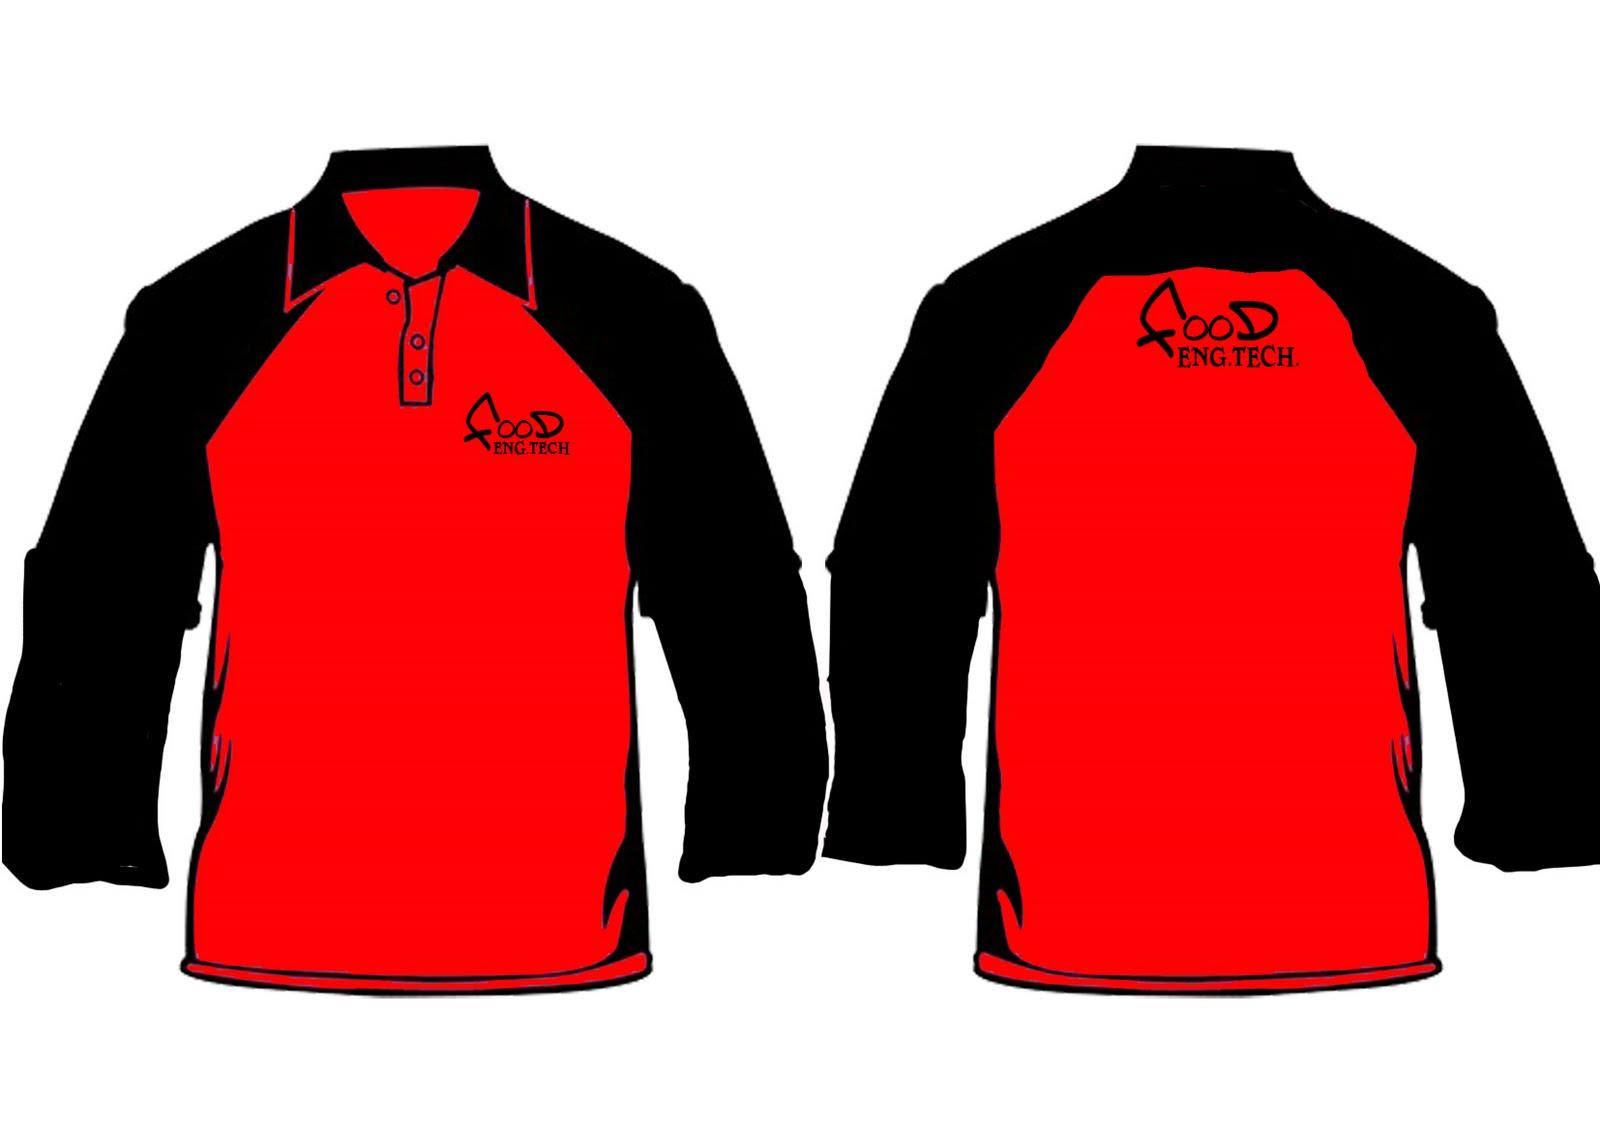 Design t shirt colar - Black T Shirt Red Collar Design T Shirt With Collar Black T Shirt With Collar